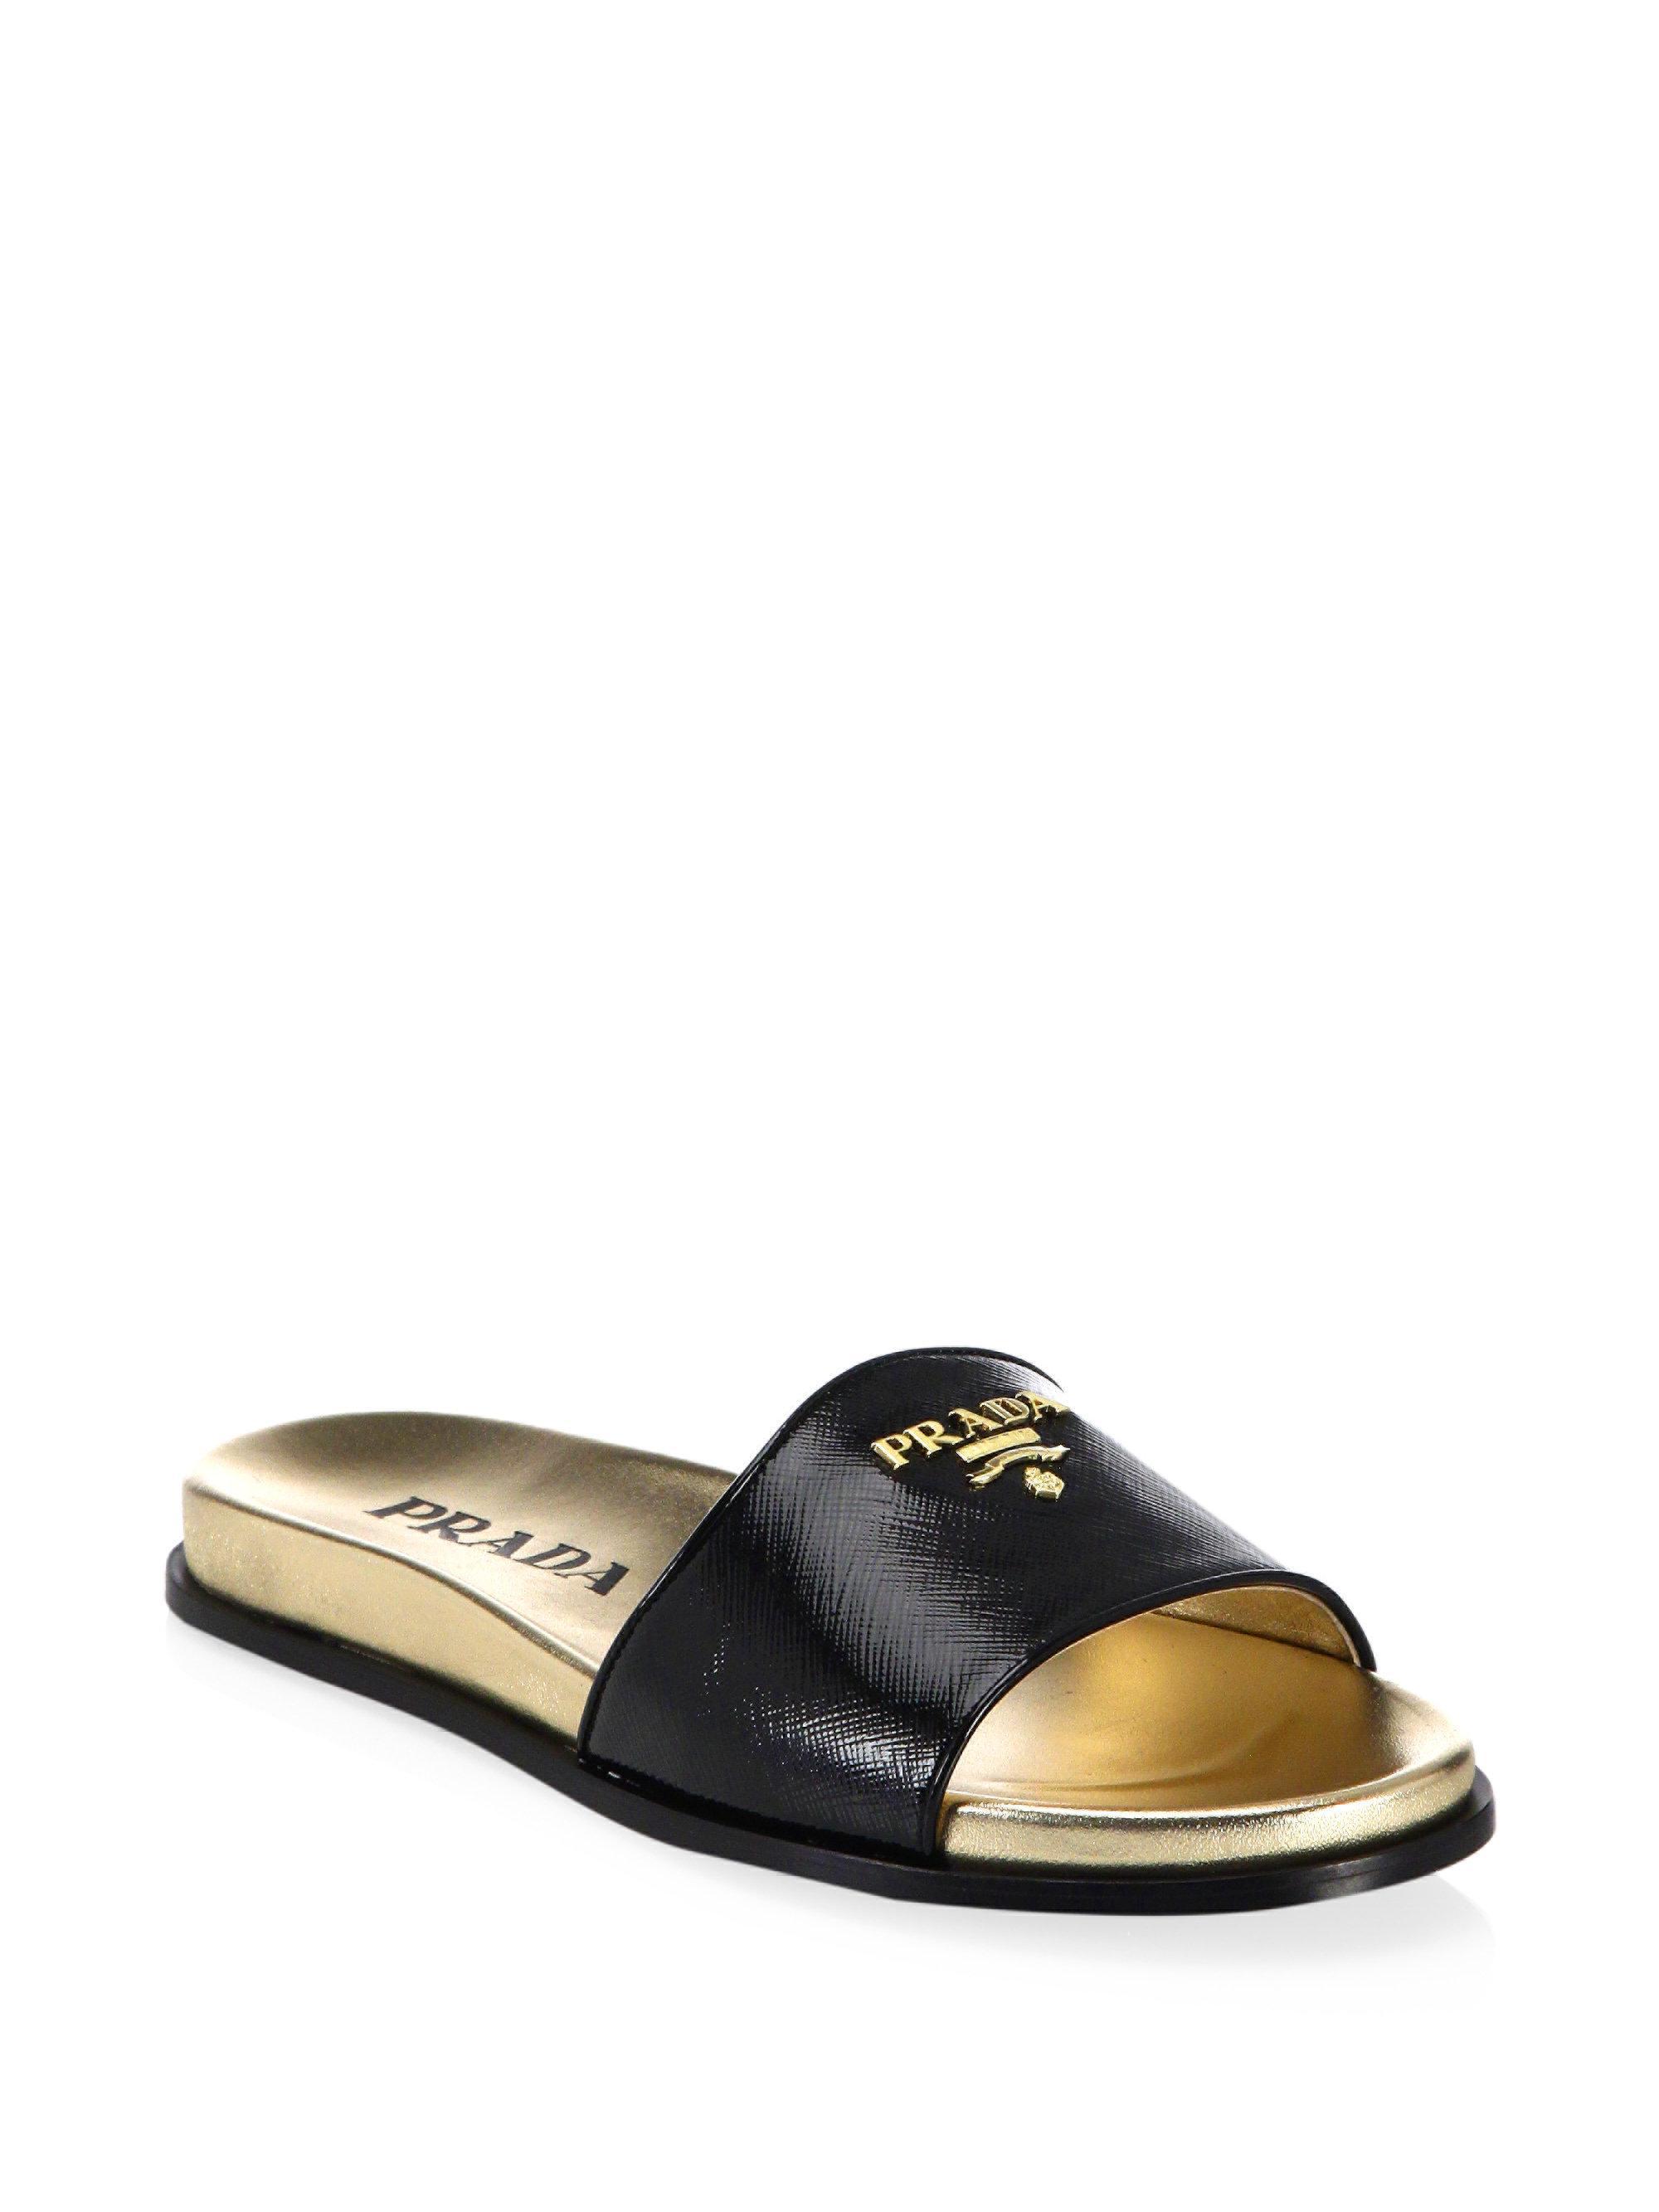 Prada Leather Logo Slide Sandals